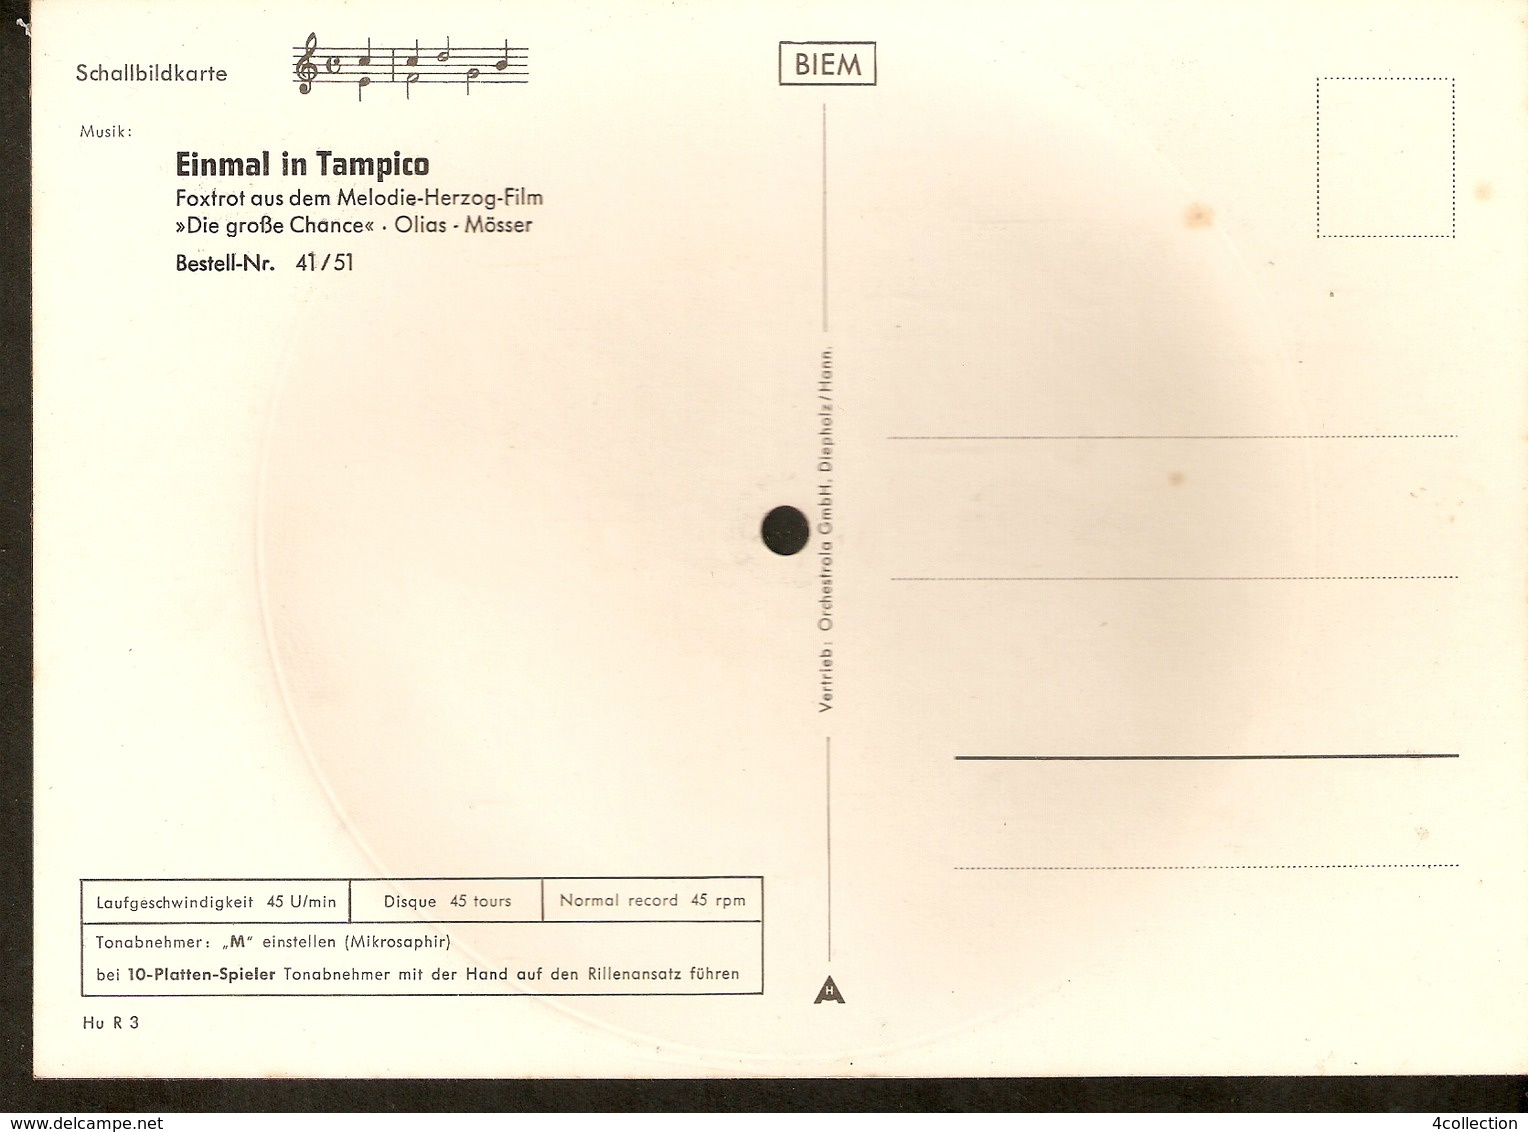 Old Musical 45rpm Record Postcard Einmal In Tampico Schallbildkarte Dog Poodle Melodie Herzog Film Die Grosse Chance Oli - Unclassified